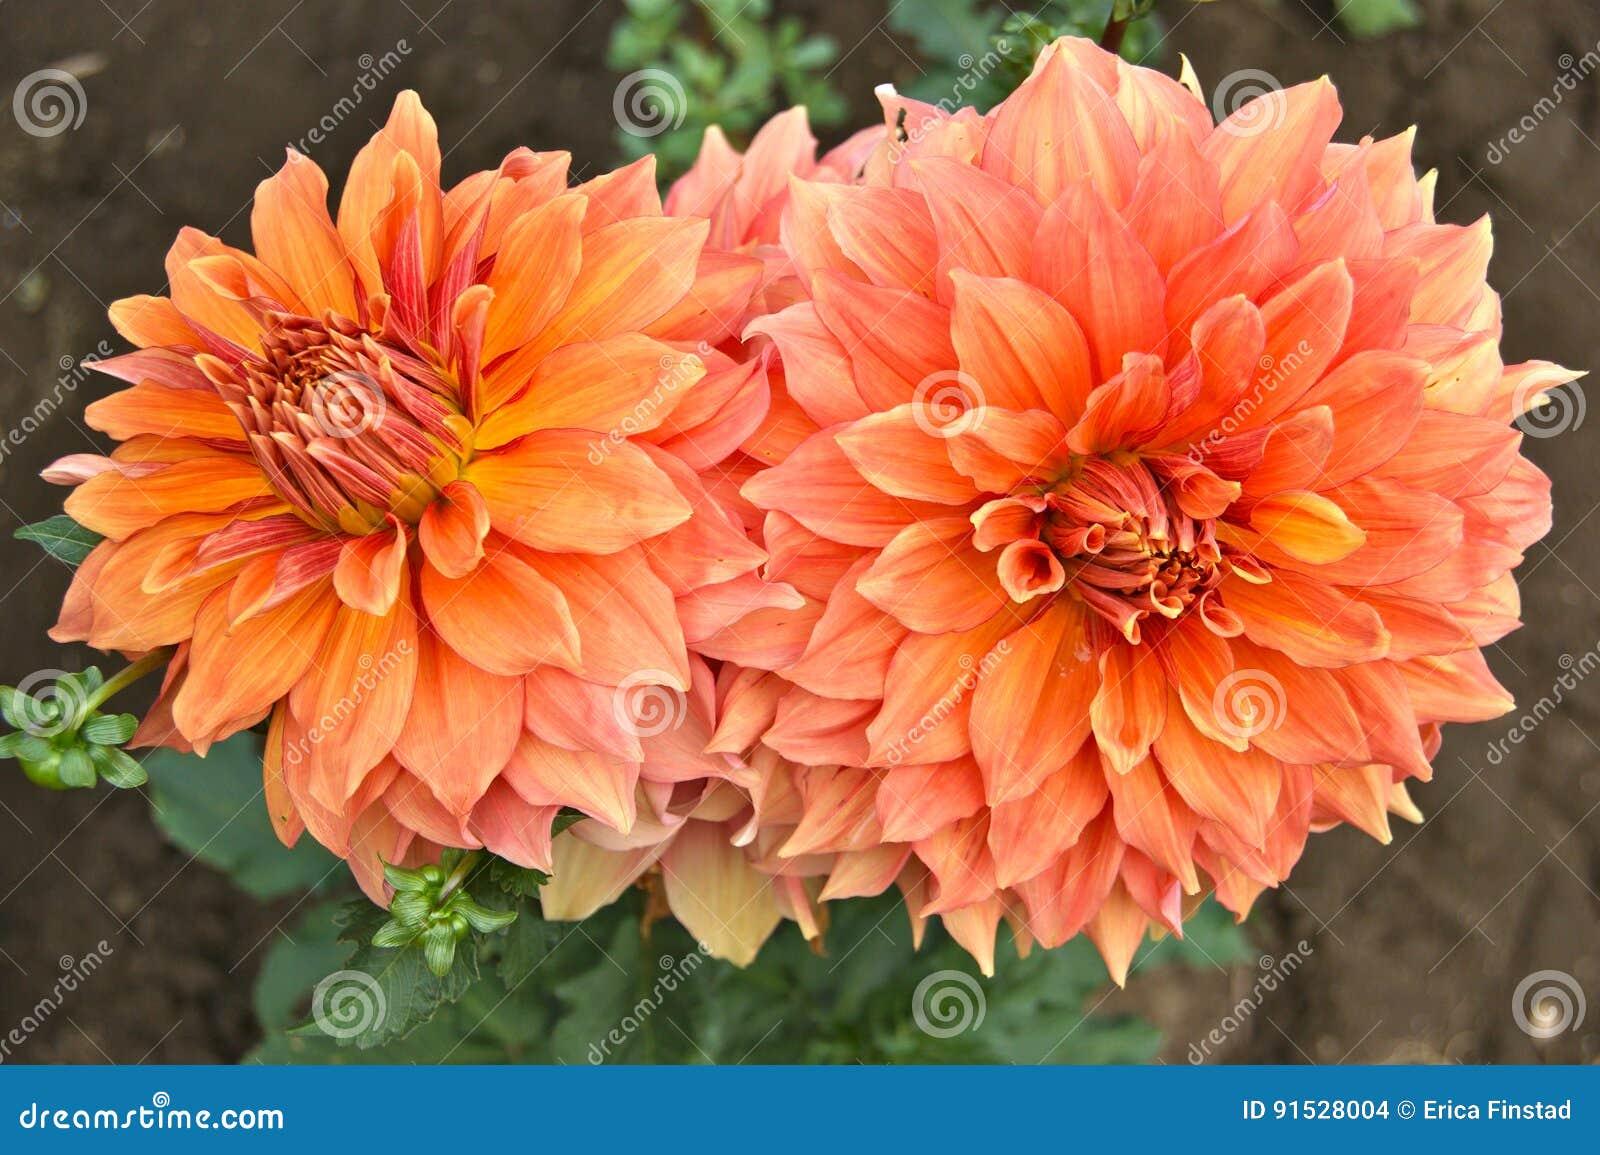 Close up of two orange dahlia flowers stock photo image of dahlia download close up of two orange dahlia flowers stock photo image of dahlia flowers izmirmasajfo